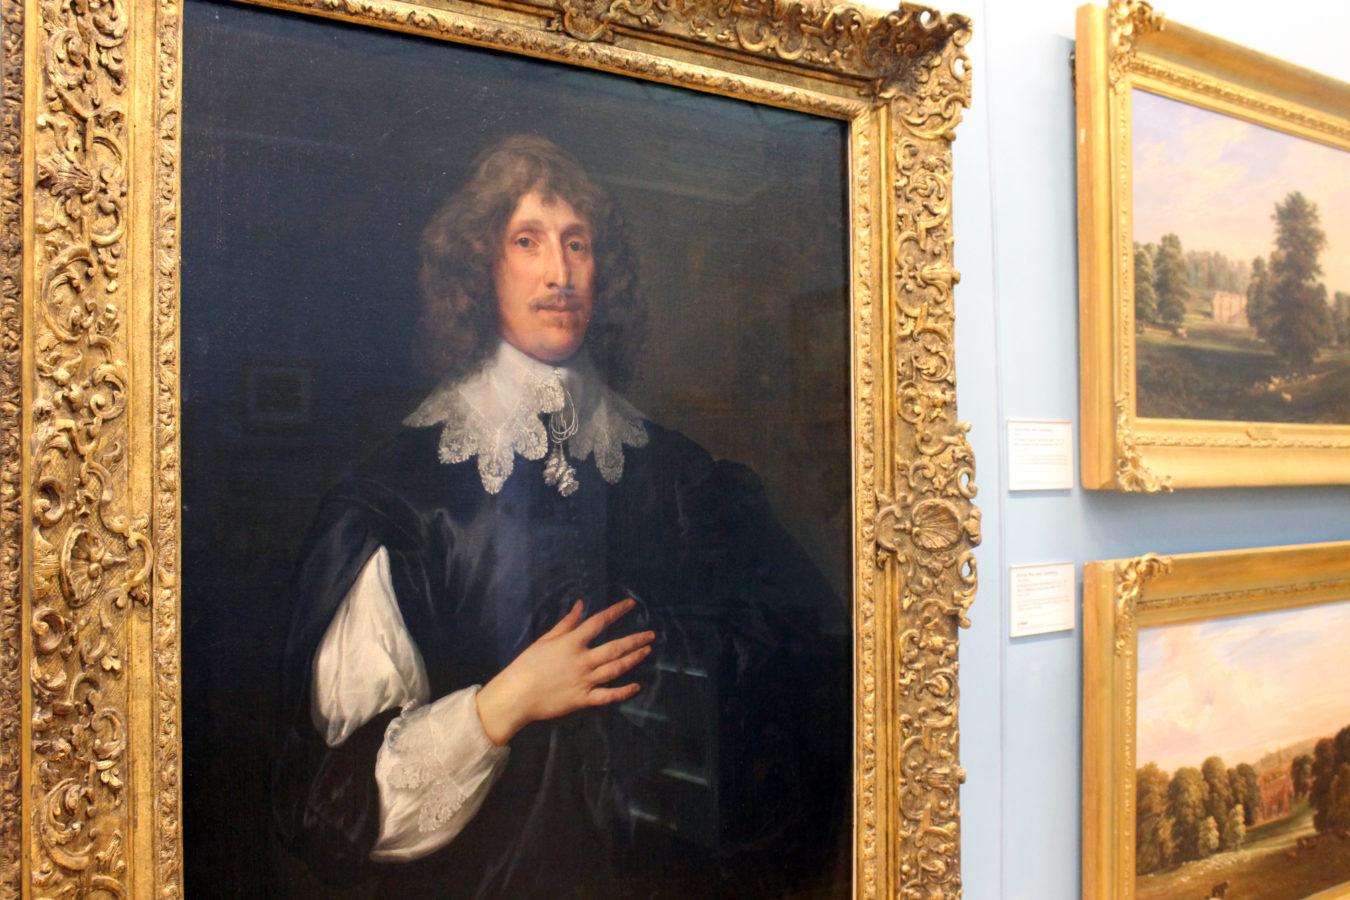 Sir Basil Dixwell by Sir Anthony van Dyck